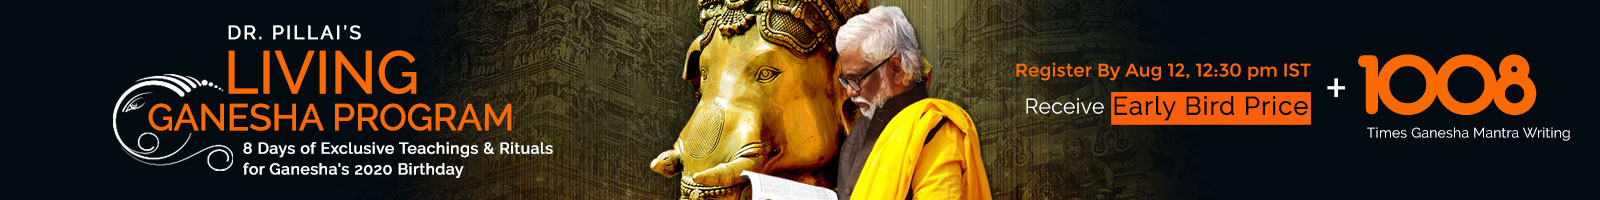 Living Ganesha Program